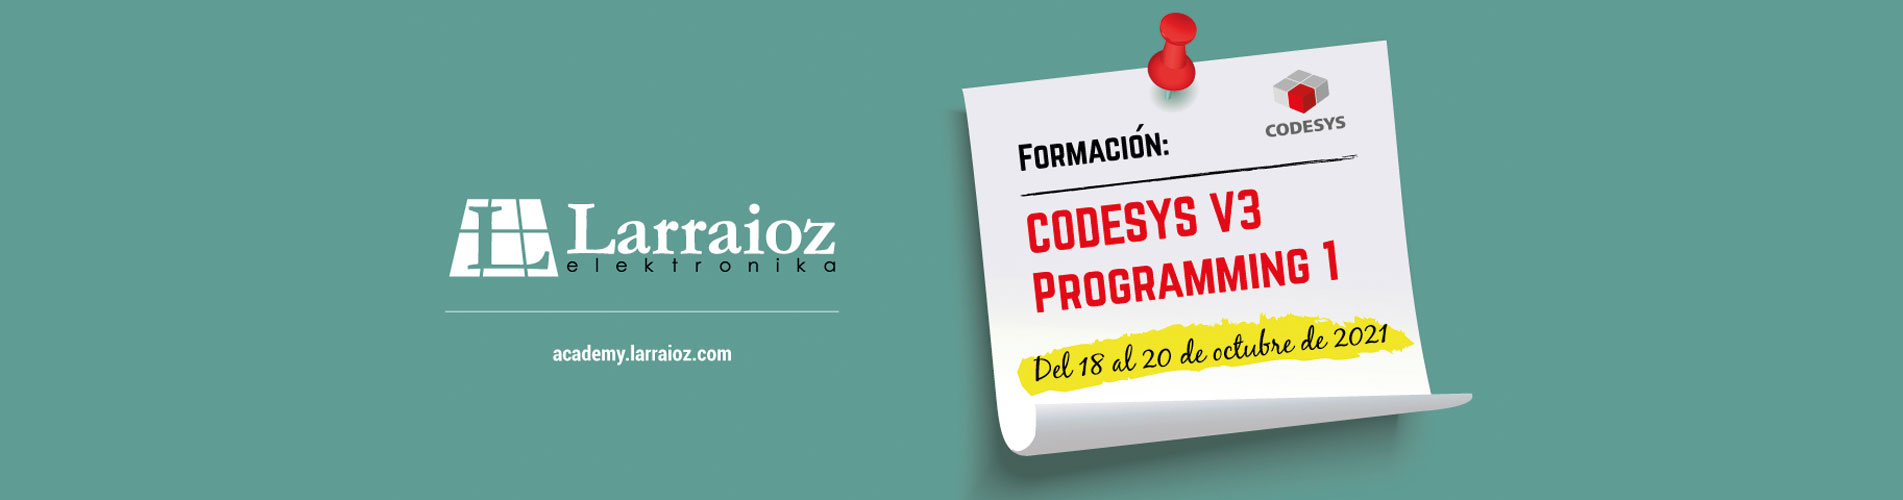 FORMACIÓN CODESYS PROGRAMMING 1 en Larraioz Elektronika